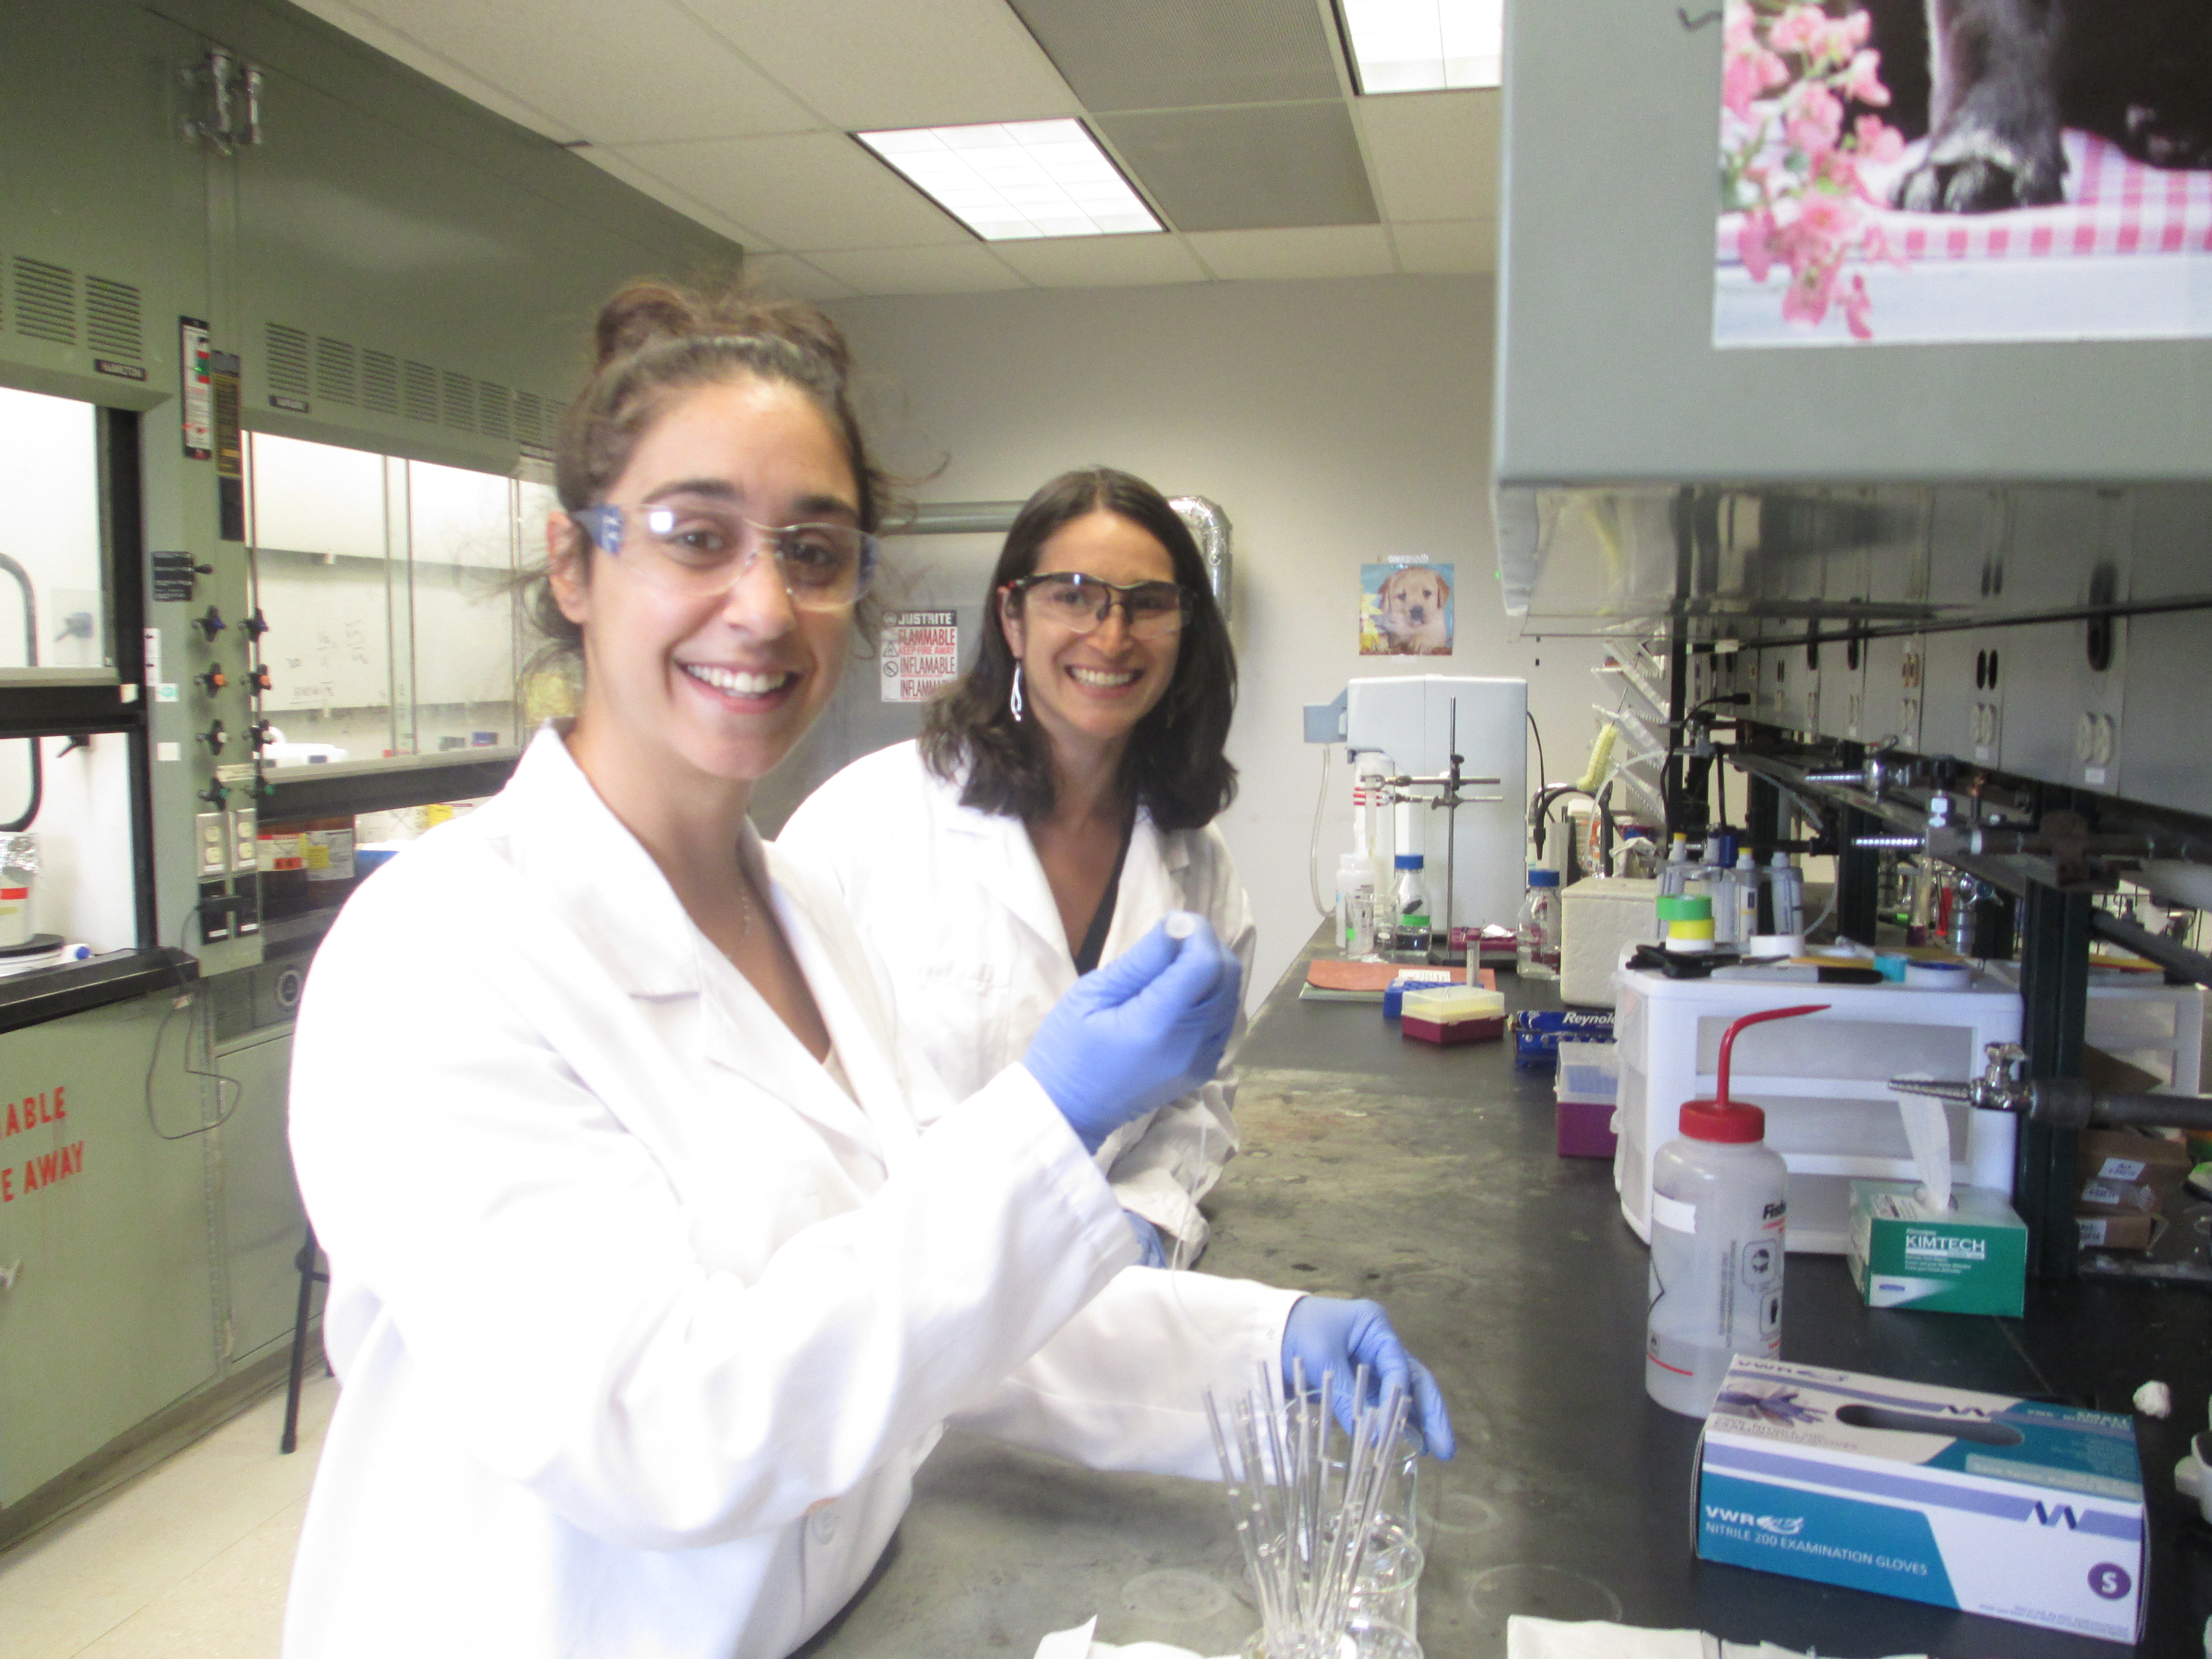 Members of OSBP in the lab